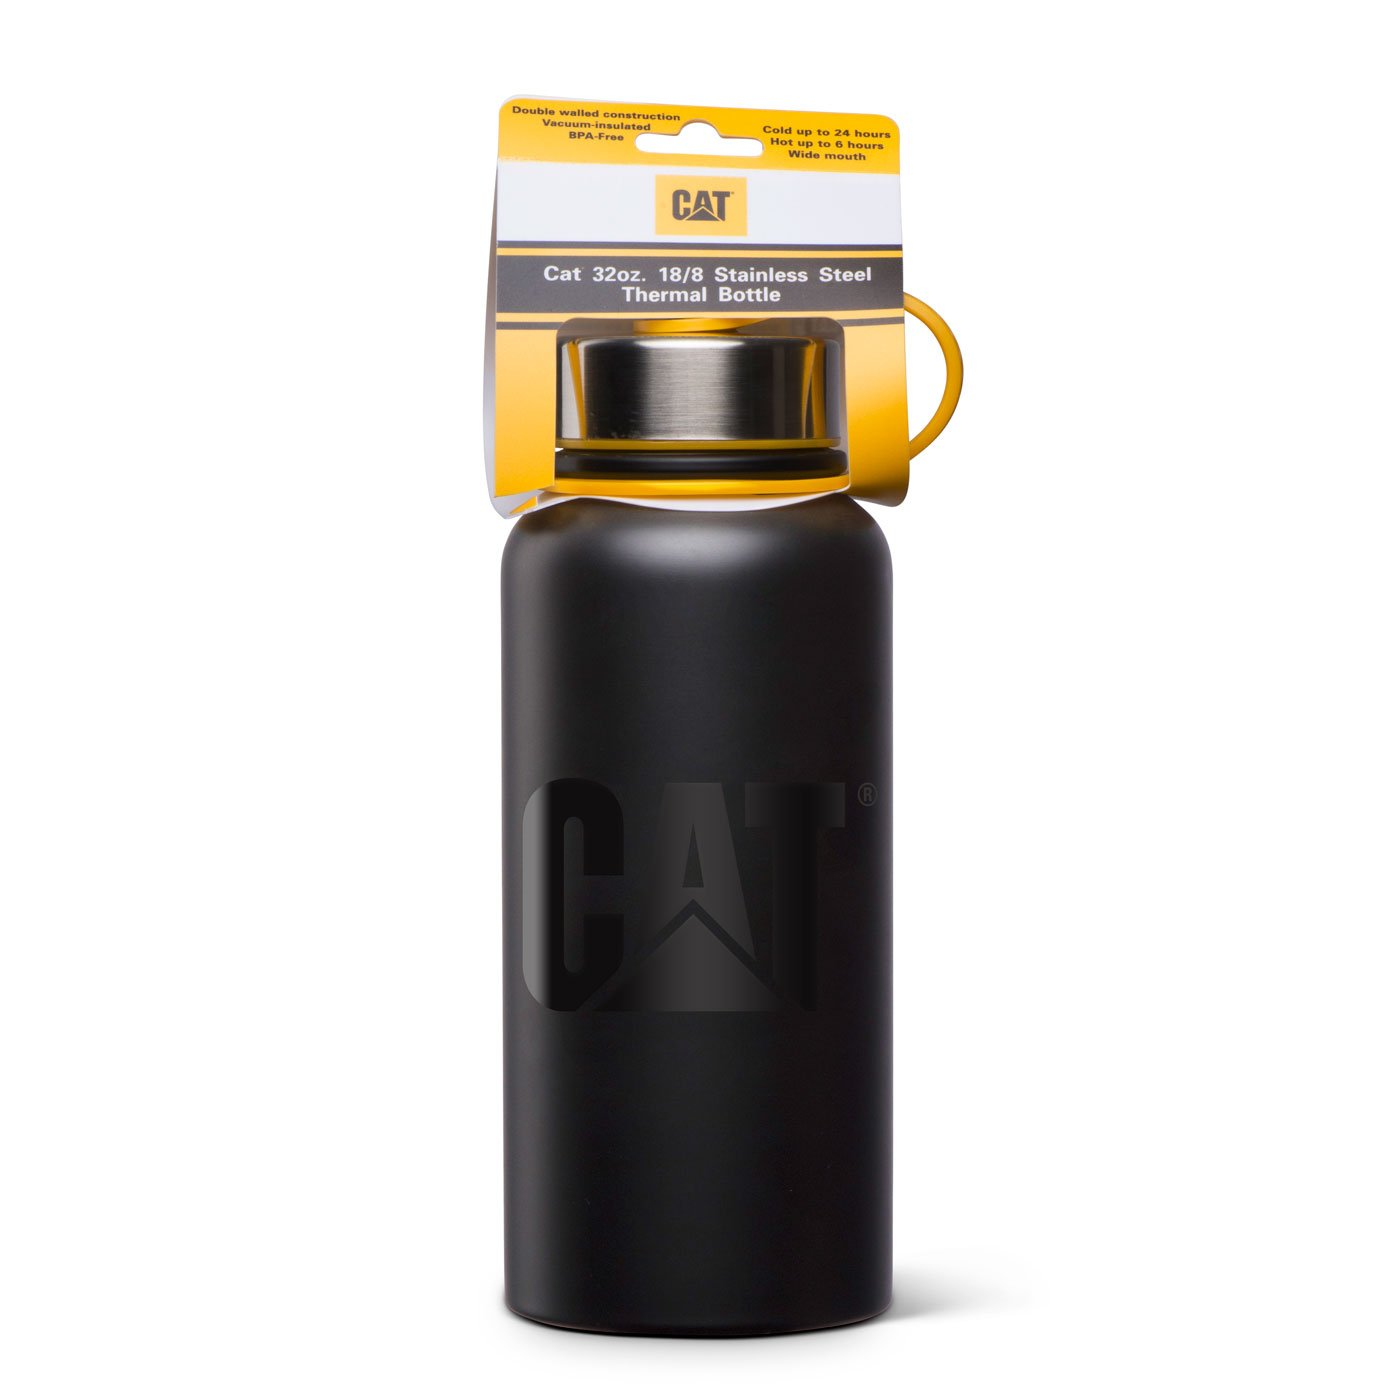 Amazon.com: Caterpillar - Botella de agua térmica de acero ...